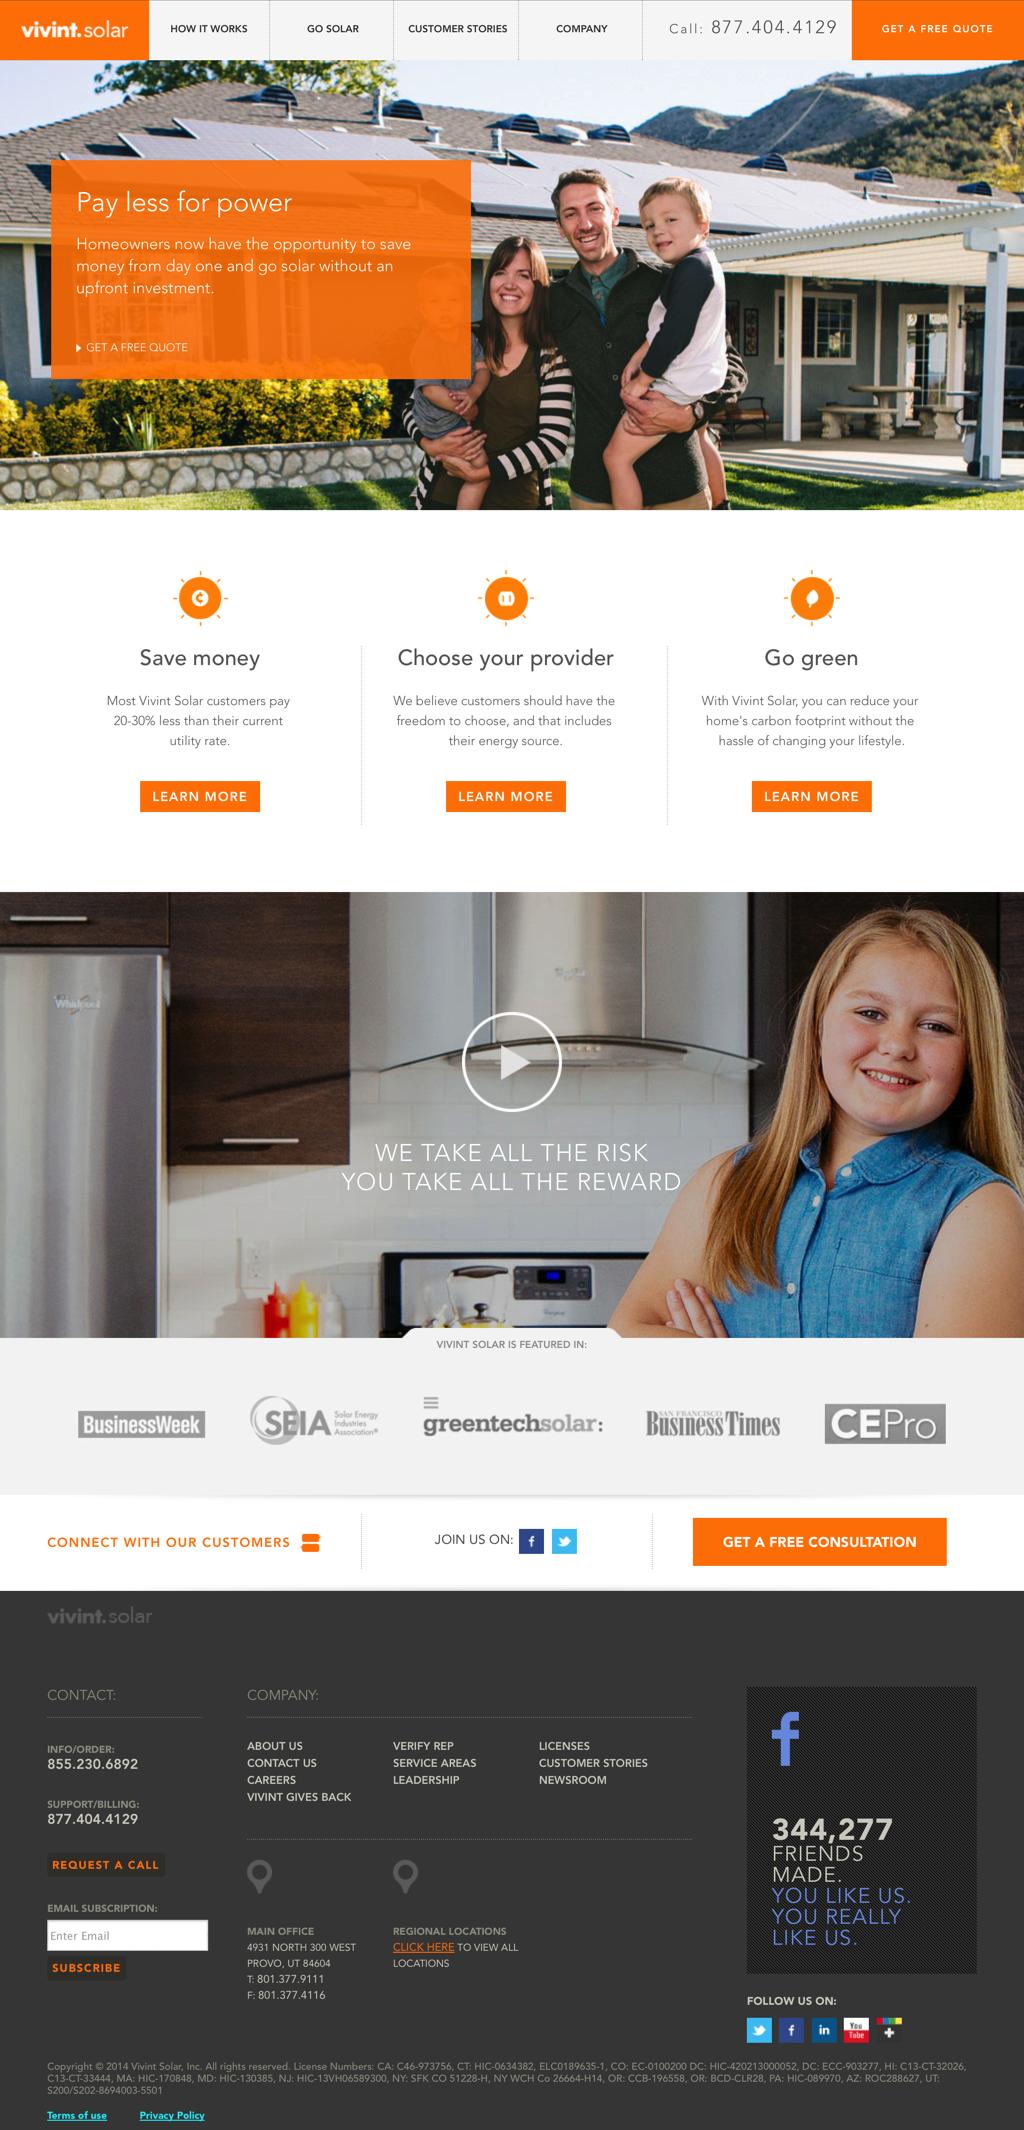 vivint solar review 2017 consumeraffairs page 2 vivint solar homepage